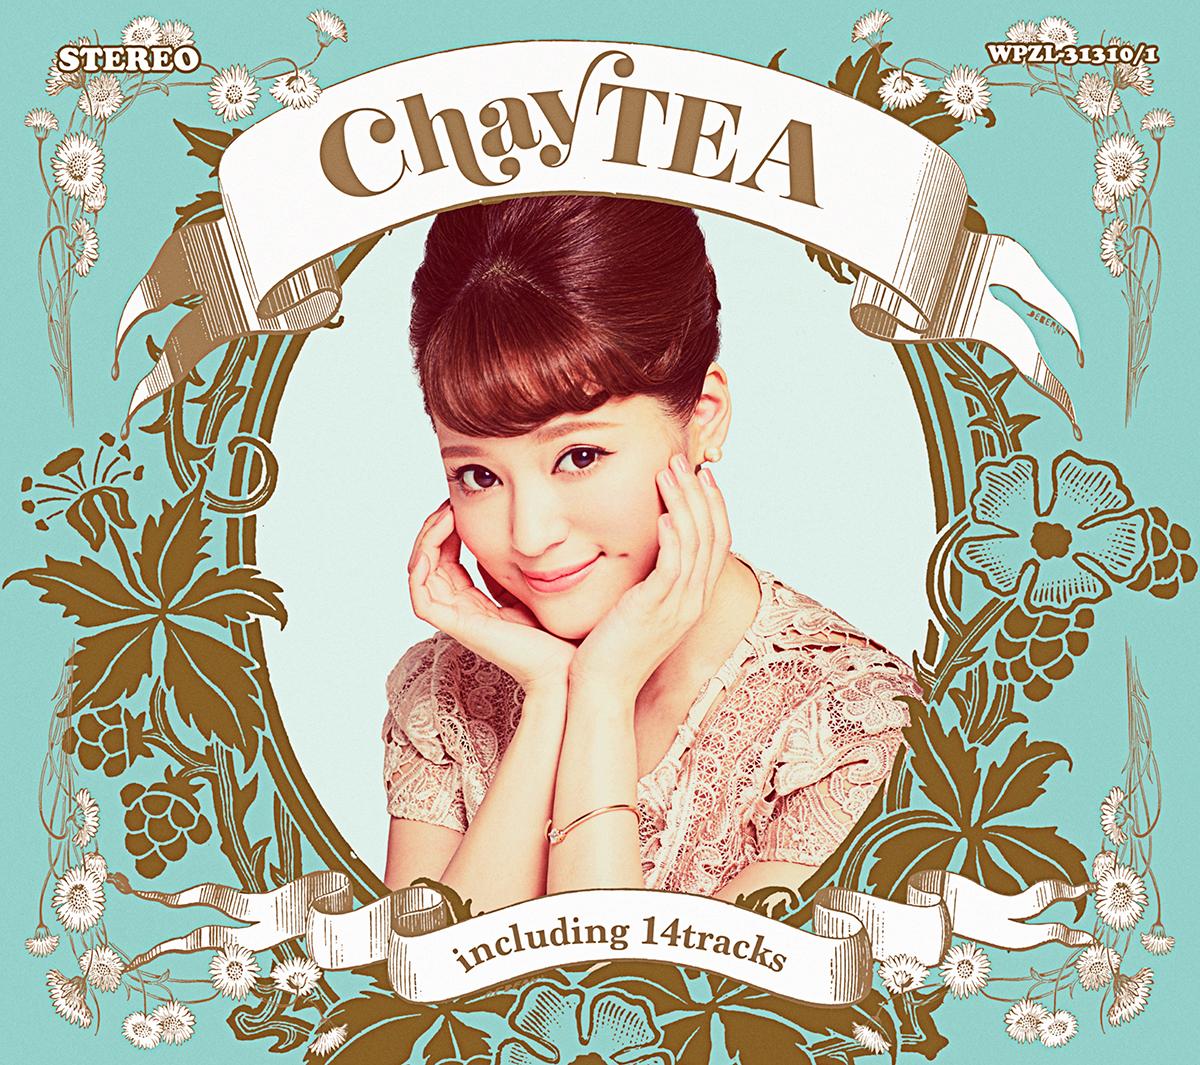 20170701.1418.04 chay - chayTEA (M4A) cover.jpg